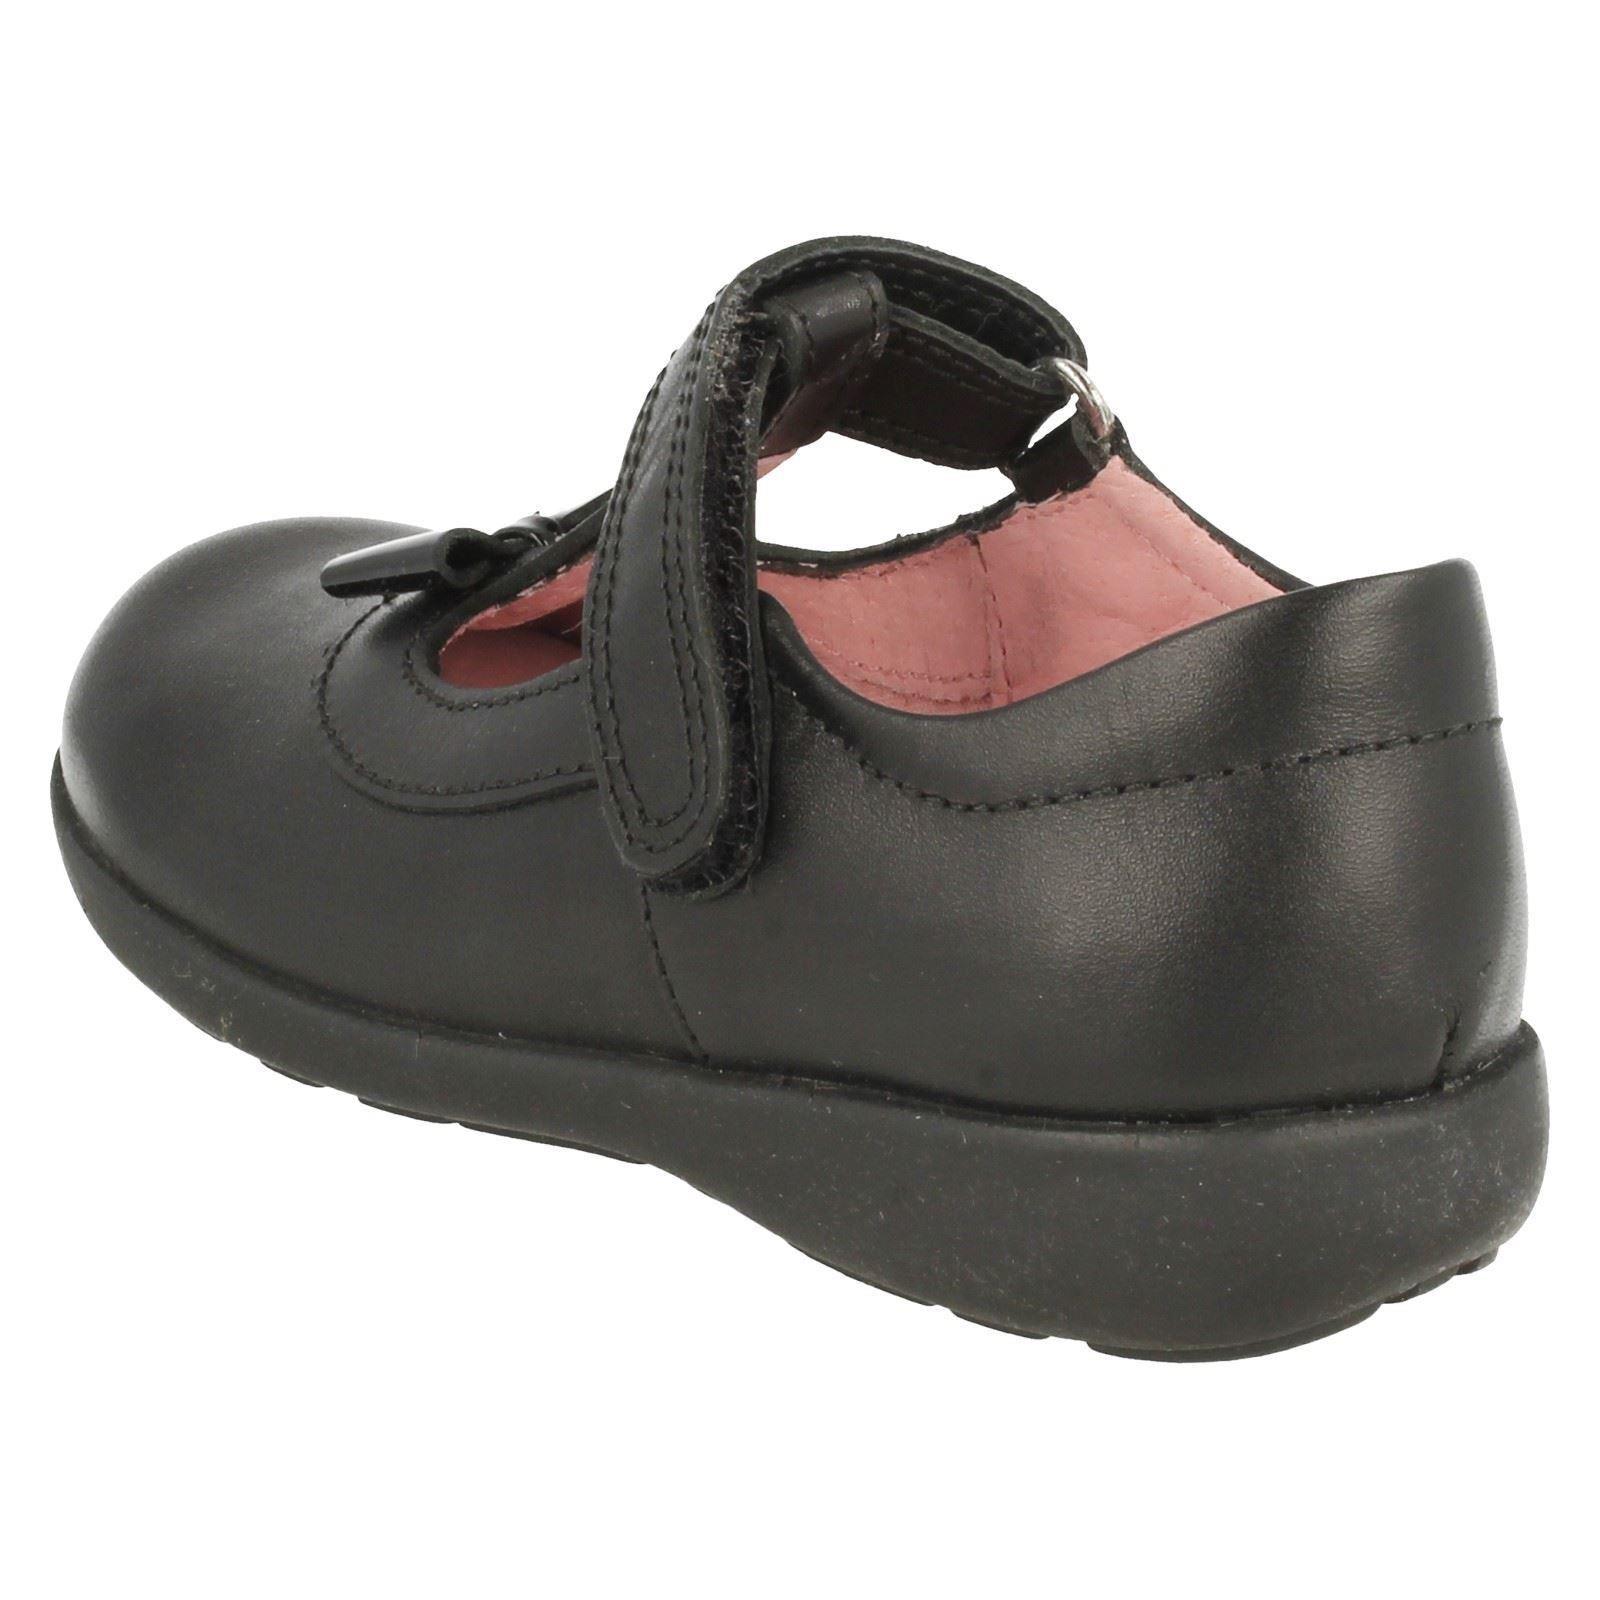 Infant-Girls-Startrite-Hook-amp-Loop-T-Bar-Patent-Leather-School-Shoes-Alpha